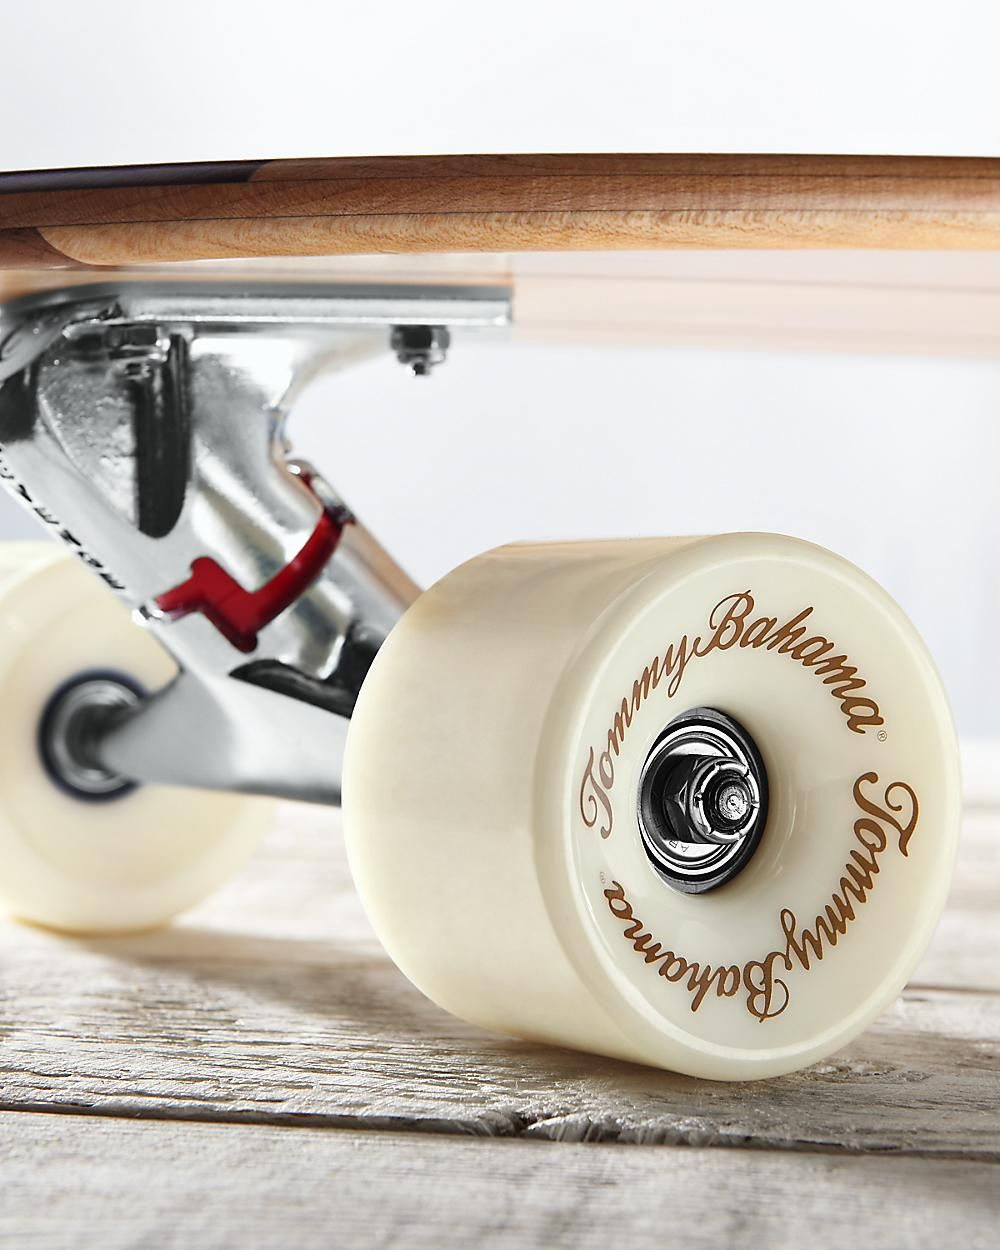 Radius Surfer Longboard